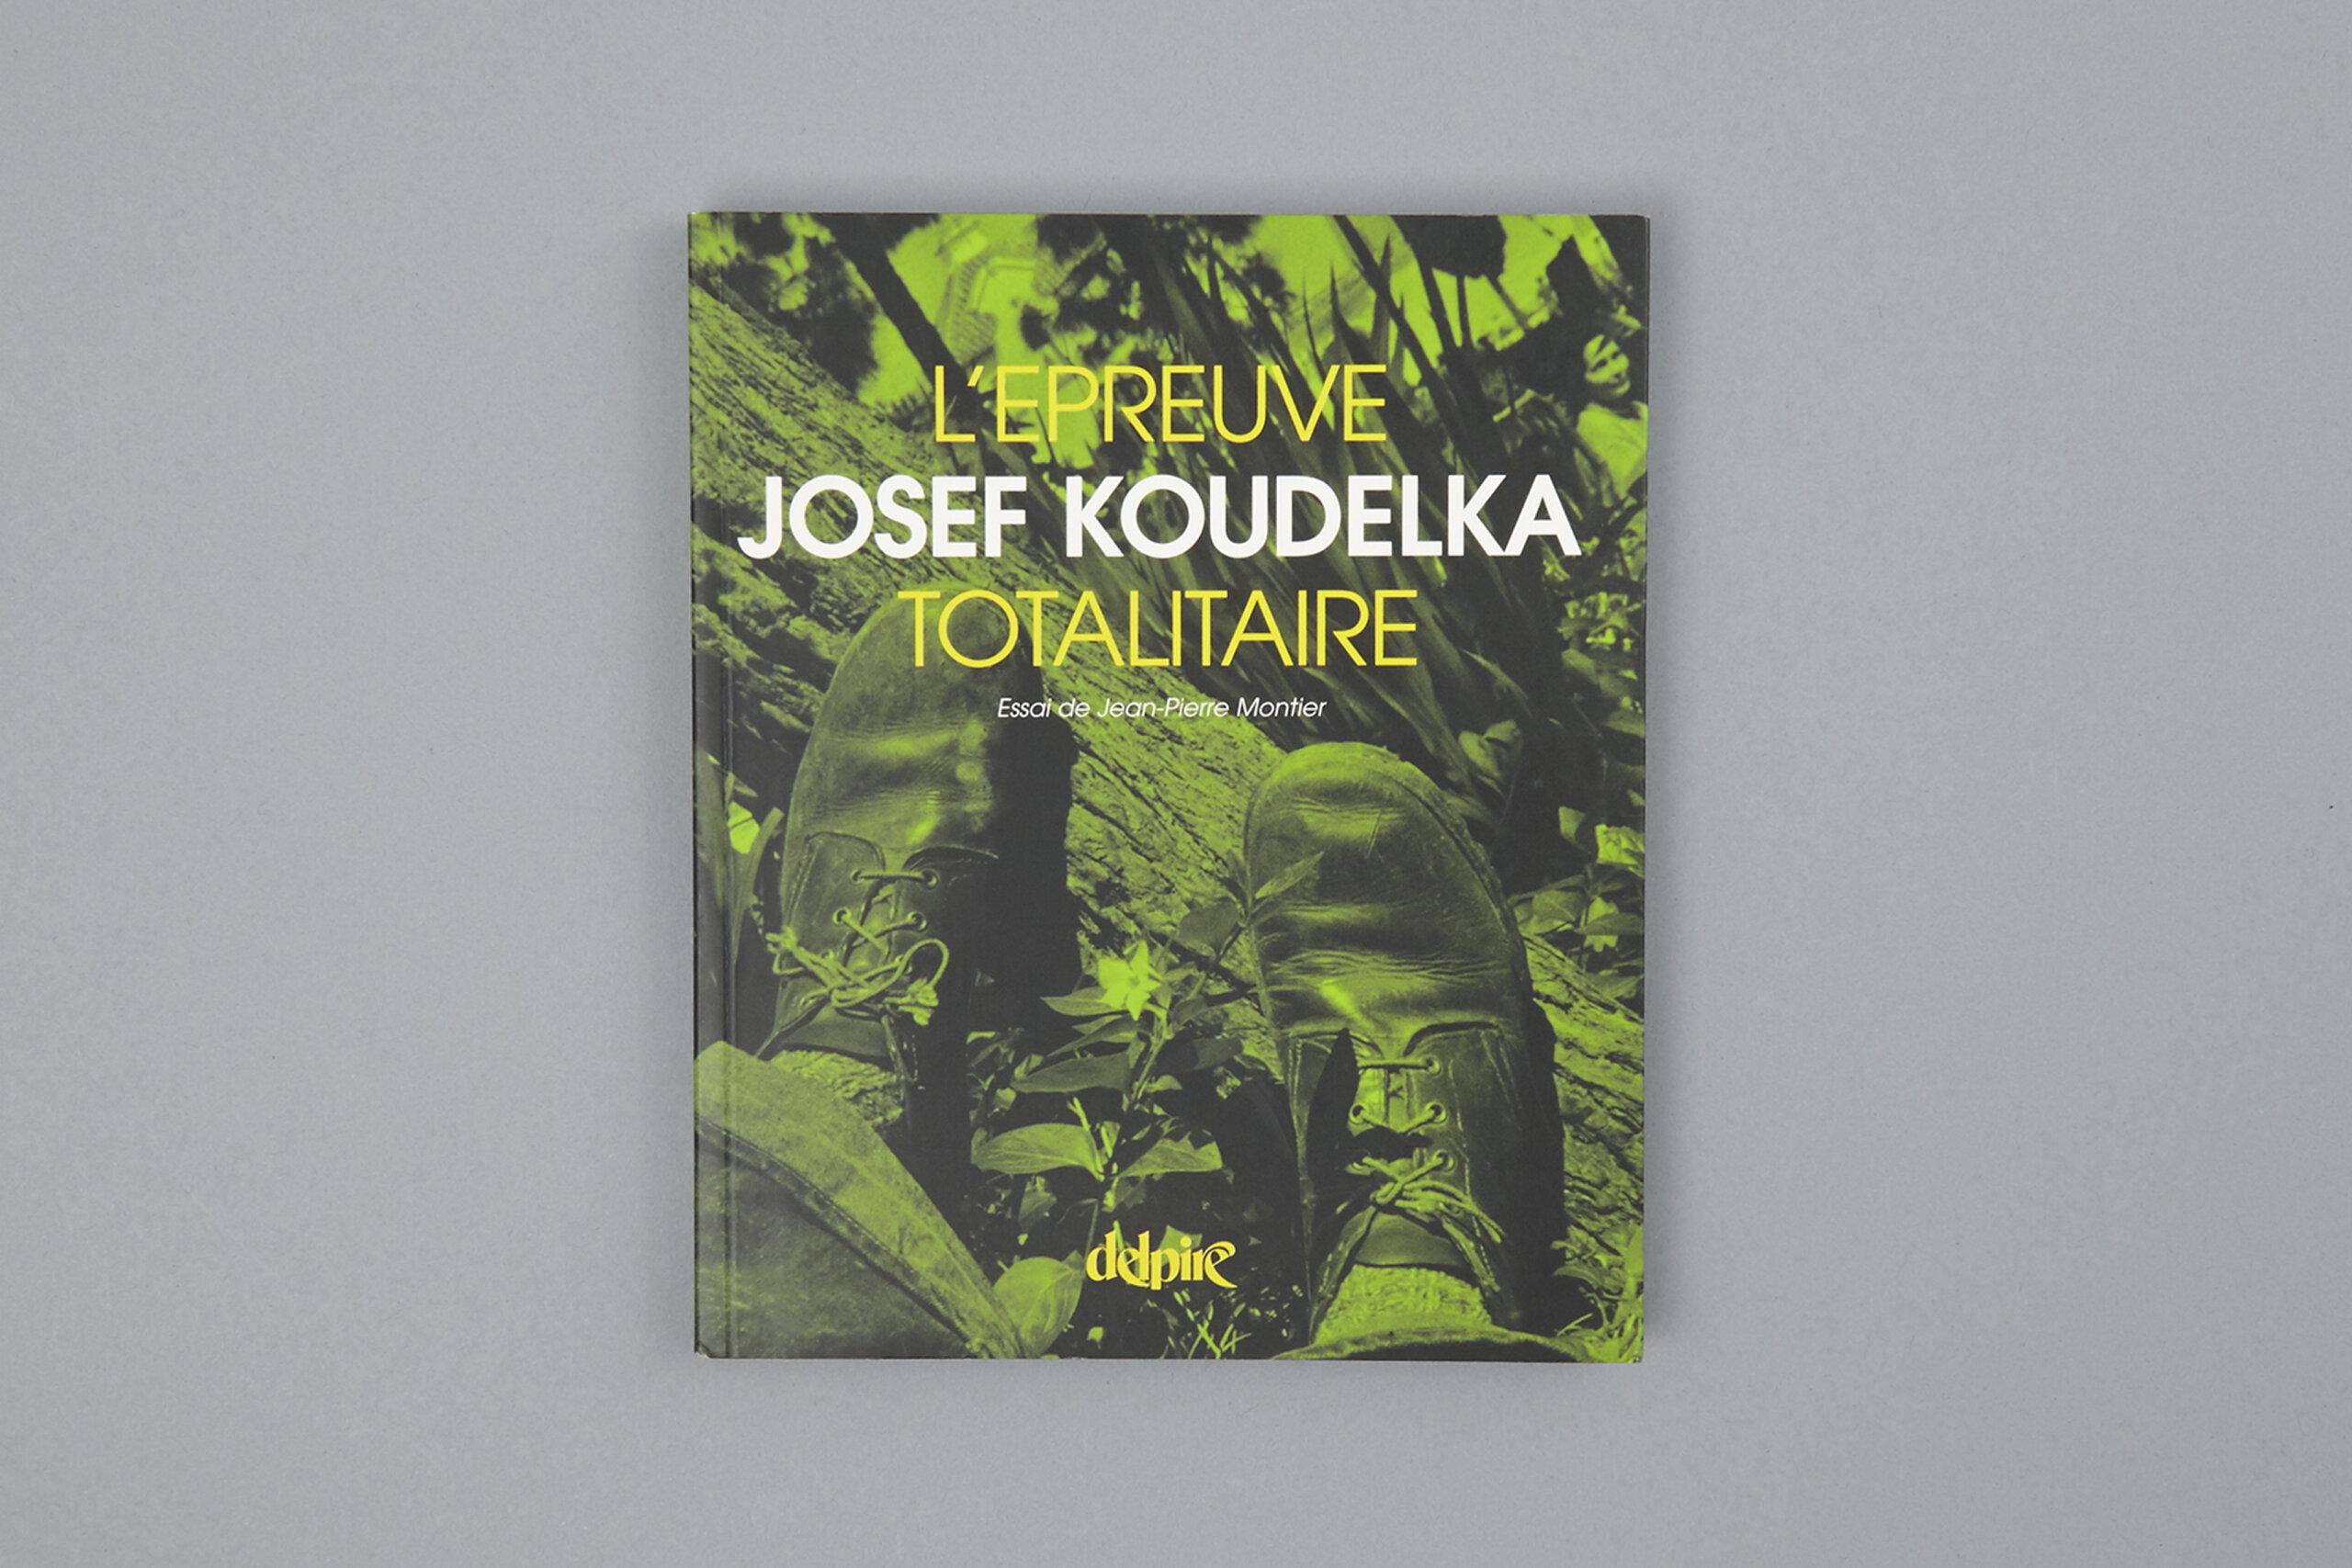 delpire-KOUDELKA-josef-l-epreuve-totalitaire